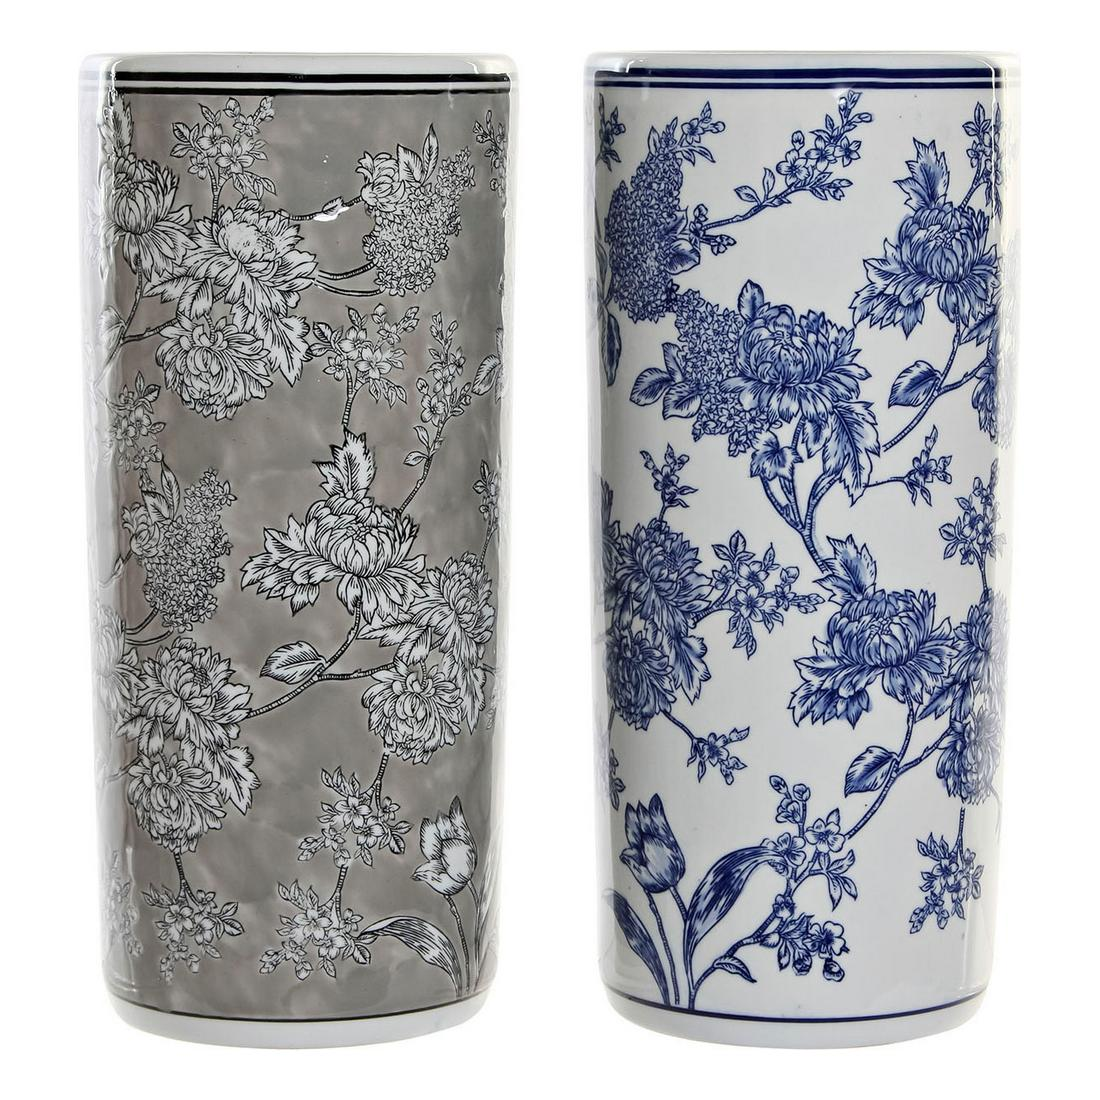 Umbrella stand DKD Home Decor Blue Grey Porcelain (2 pcs) (19.5 x 19.5 x 44 cm)